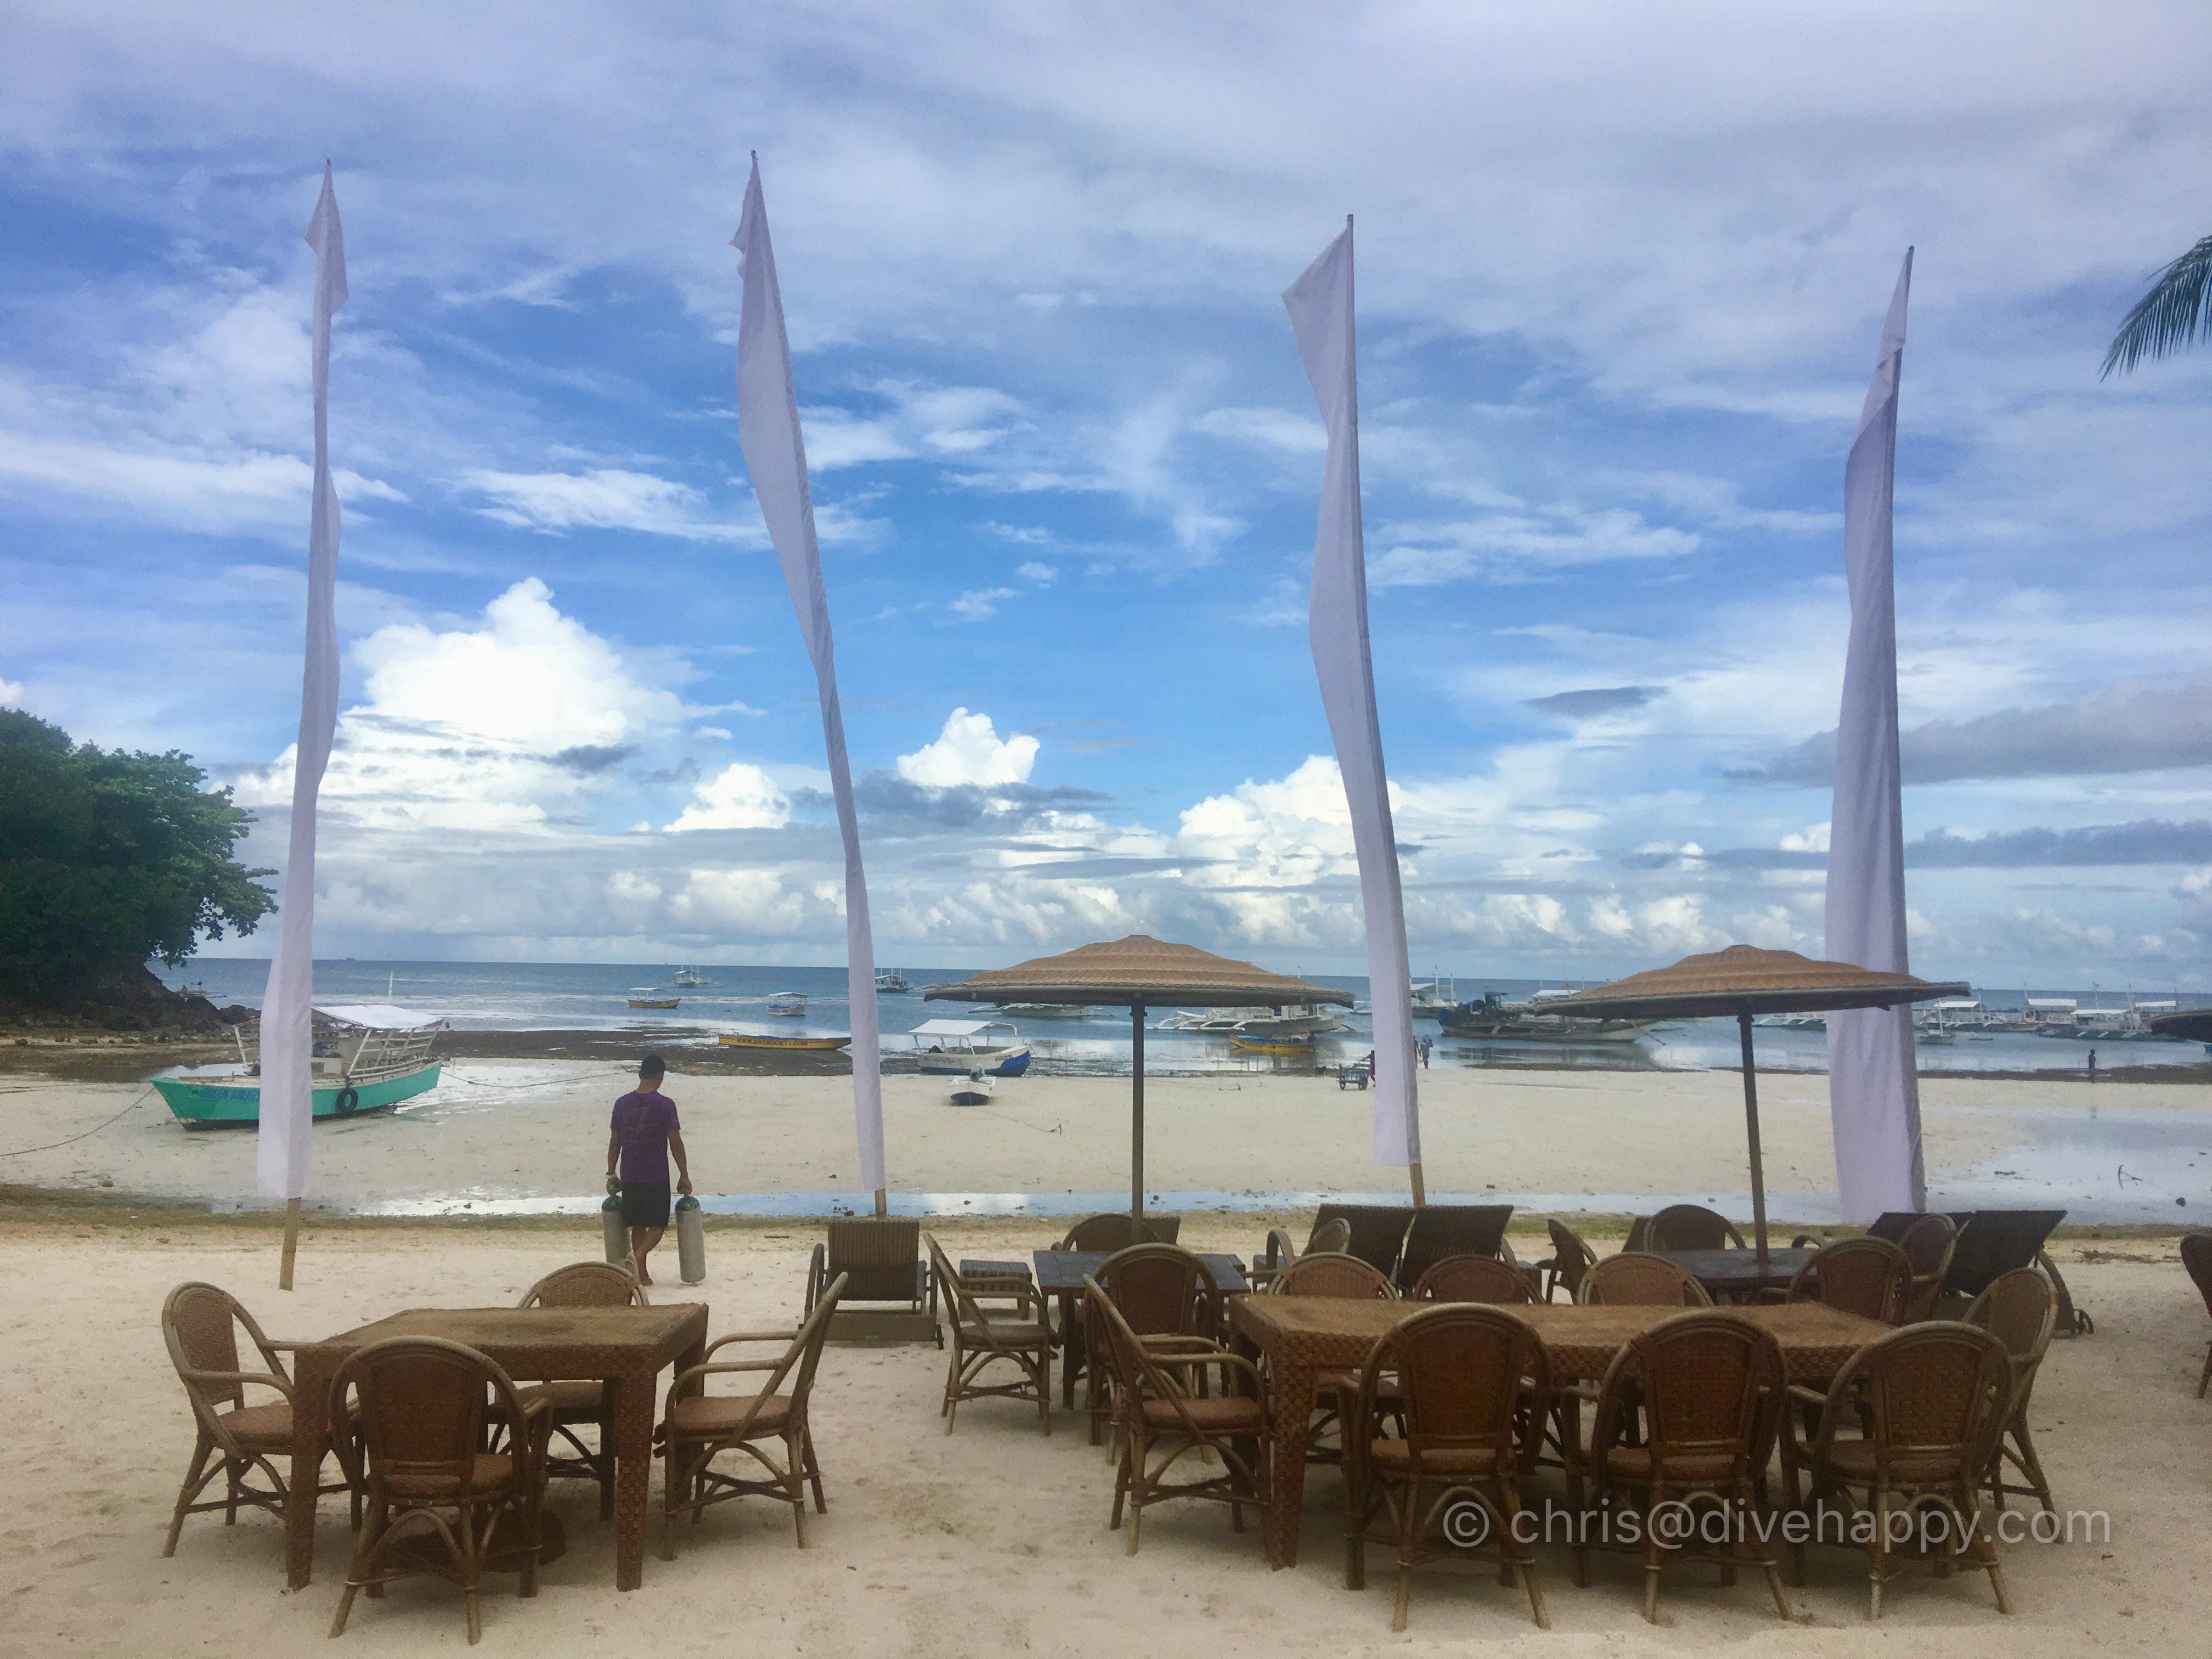 Morning view from Kokays Maldito resort restaurant